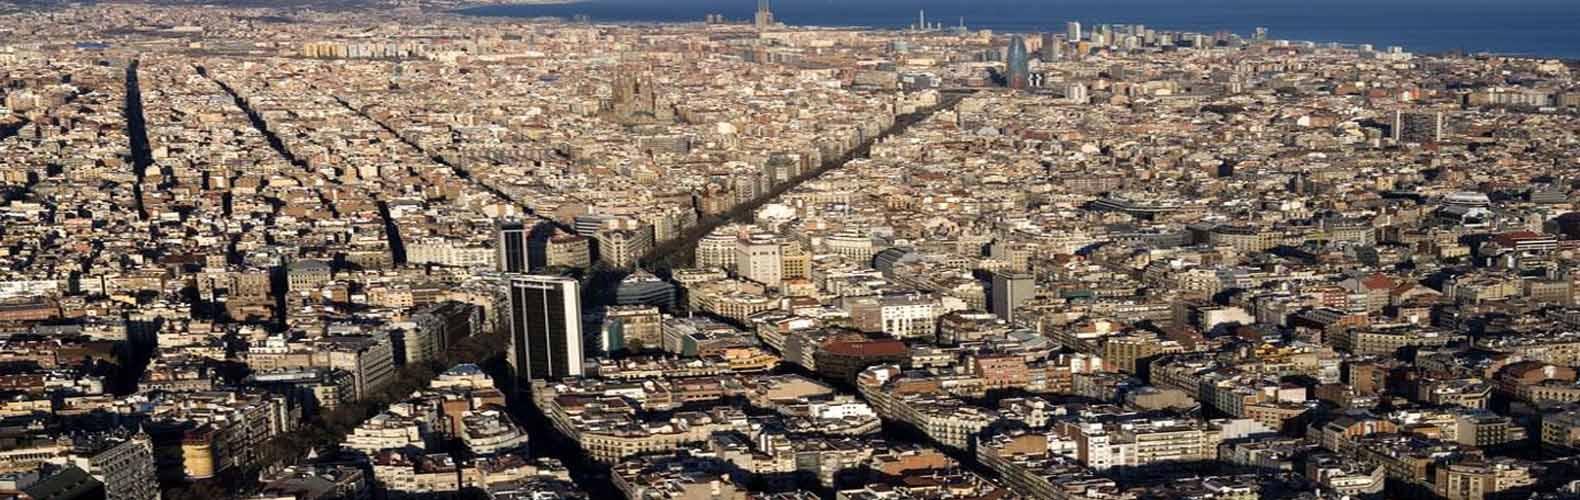 Purchasing an apartment in Dreta de l'Eixample, Barcelona